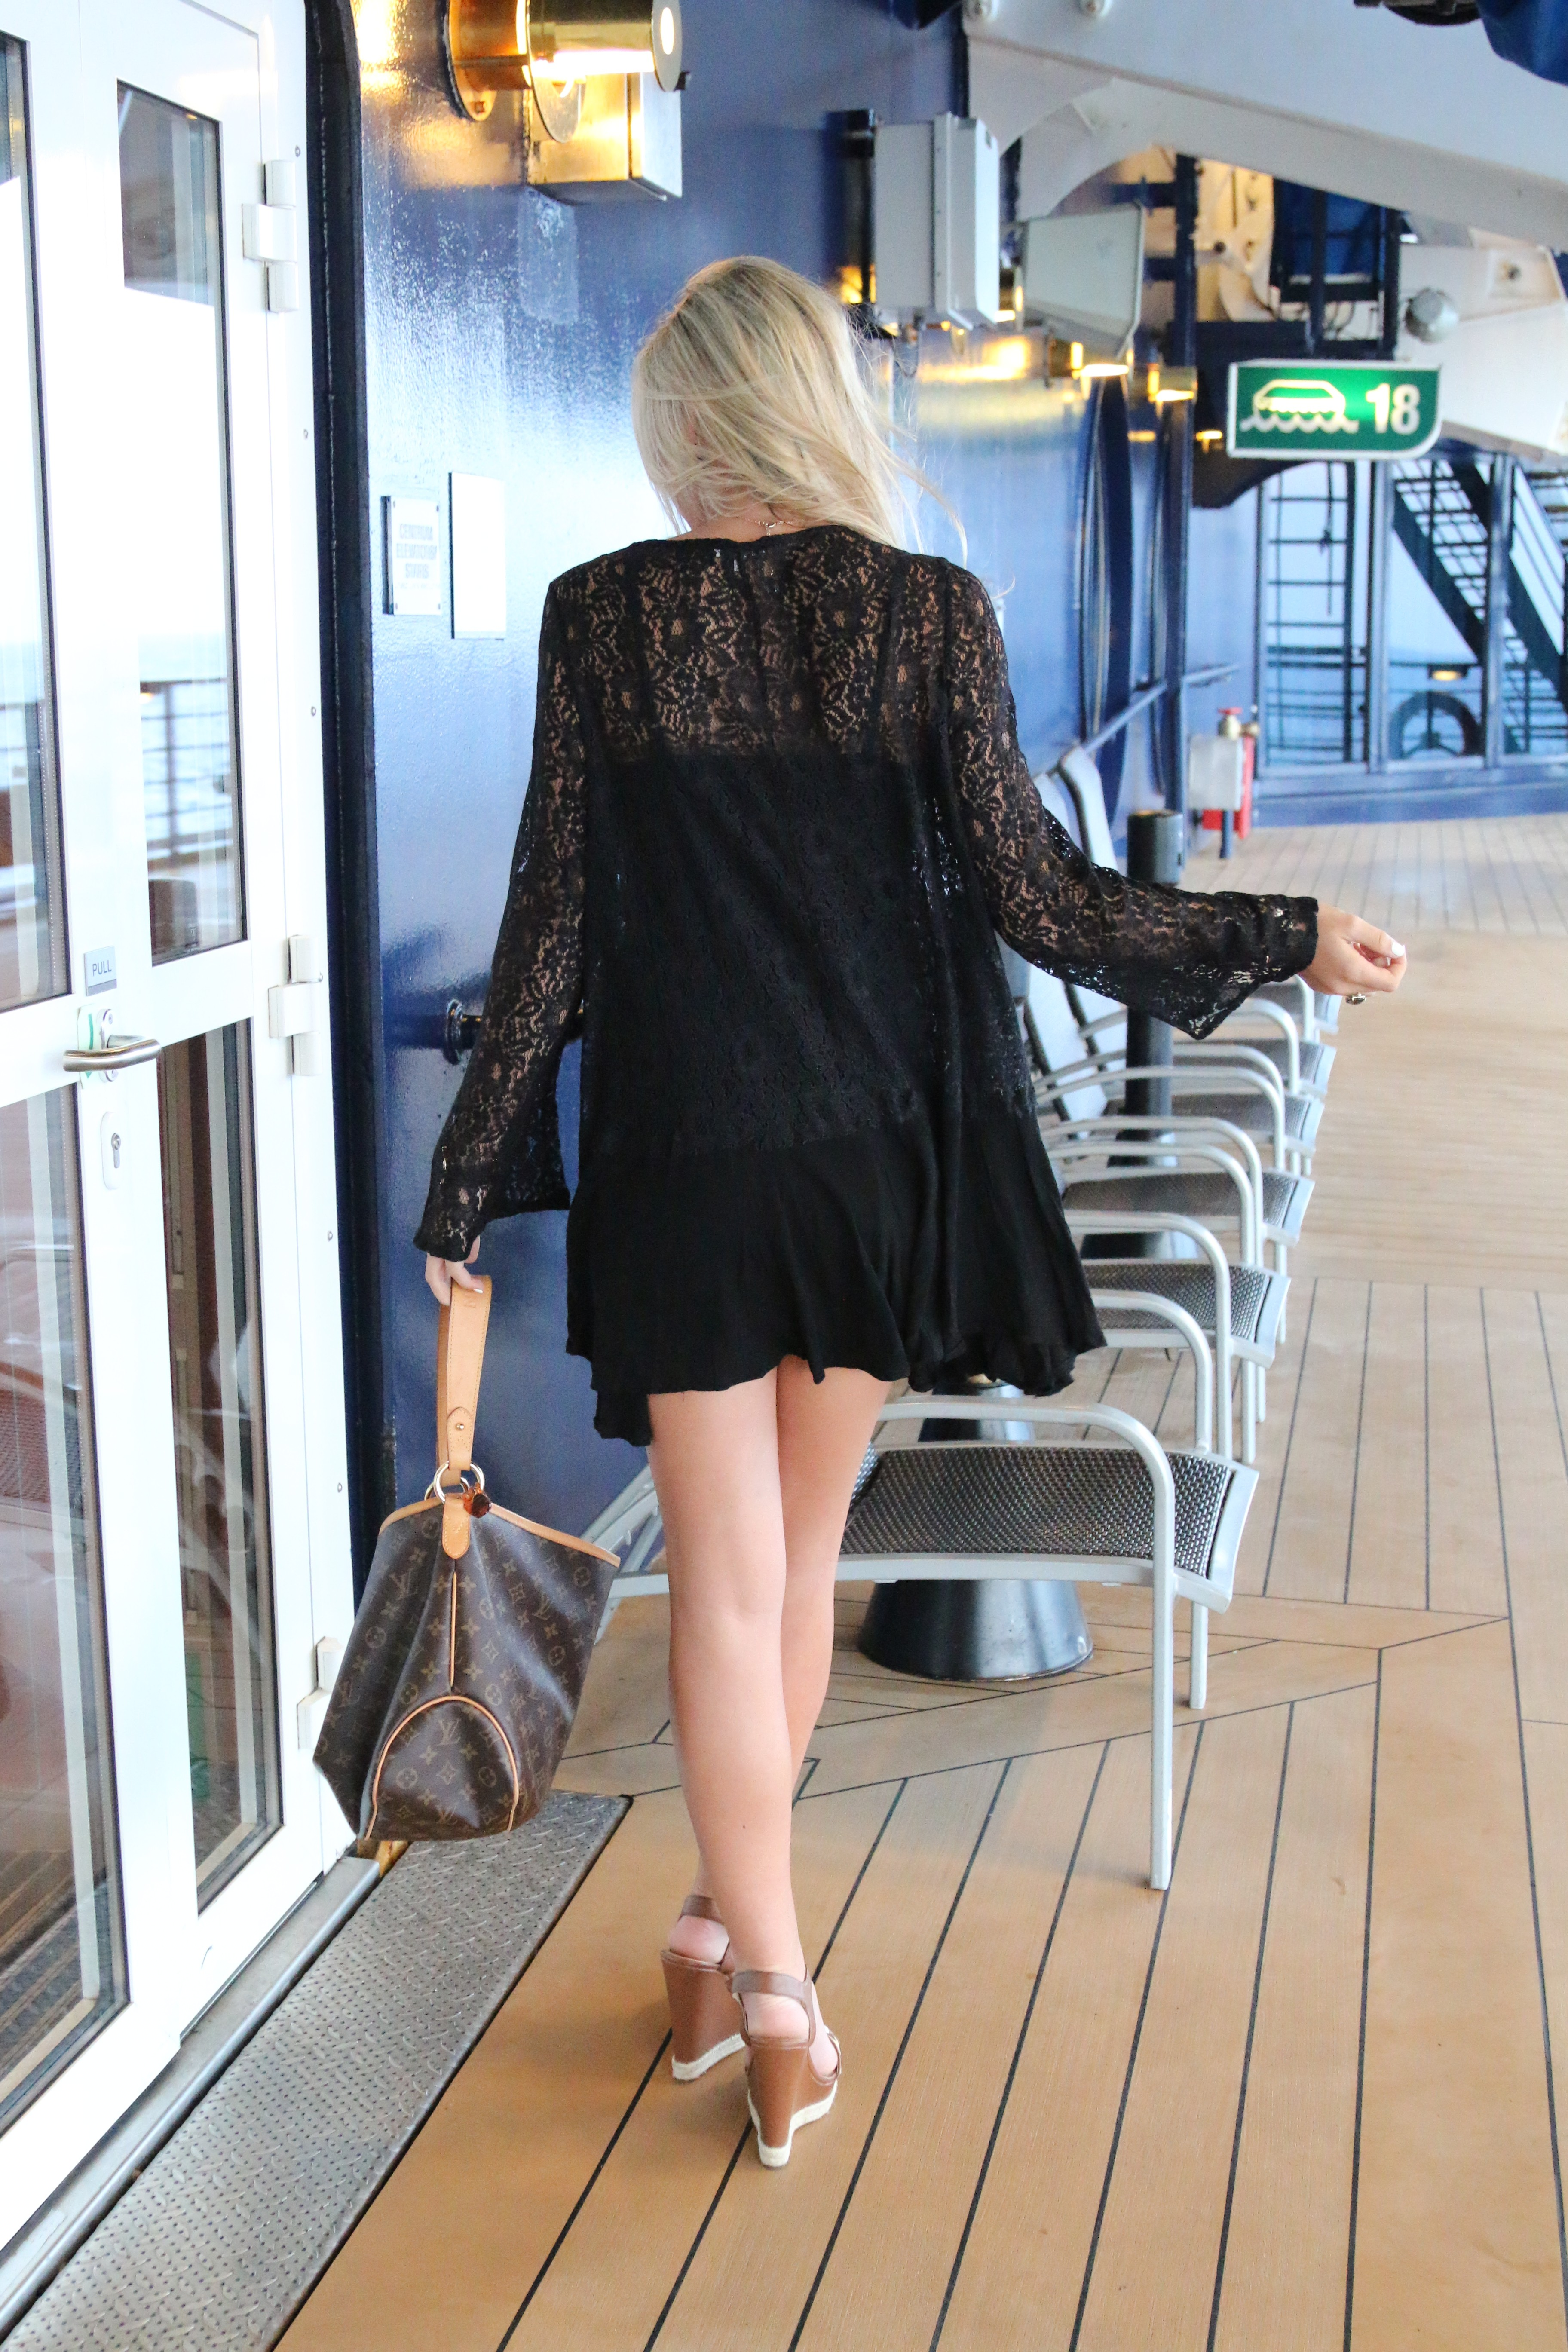 Black, Lace Dress